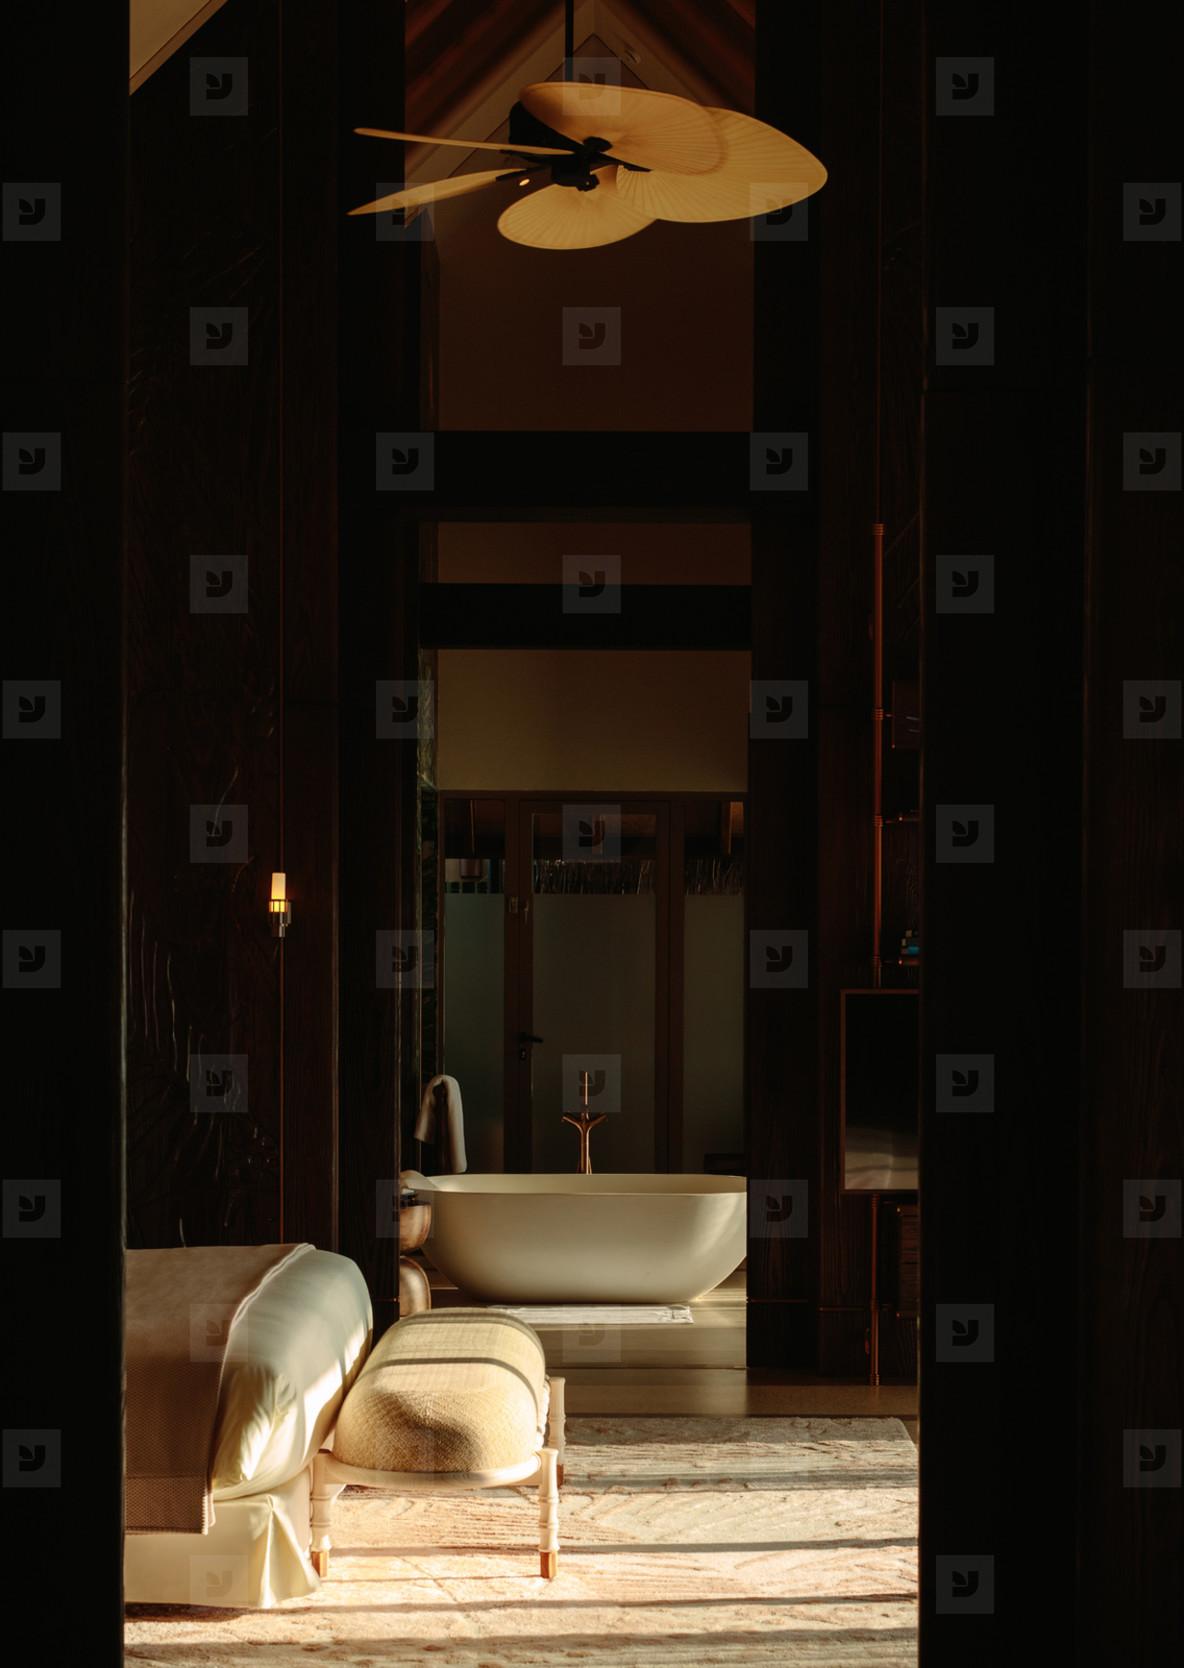 Luxury boutique hotel interior